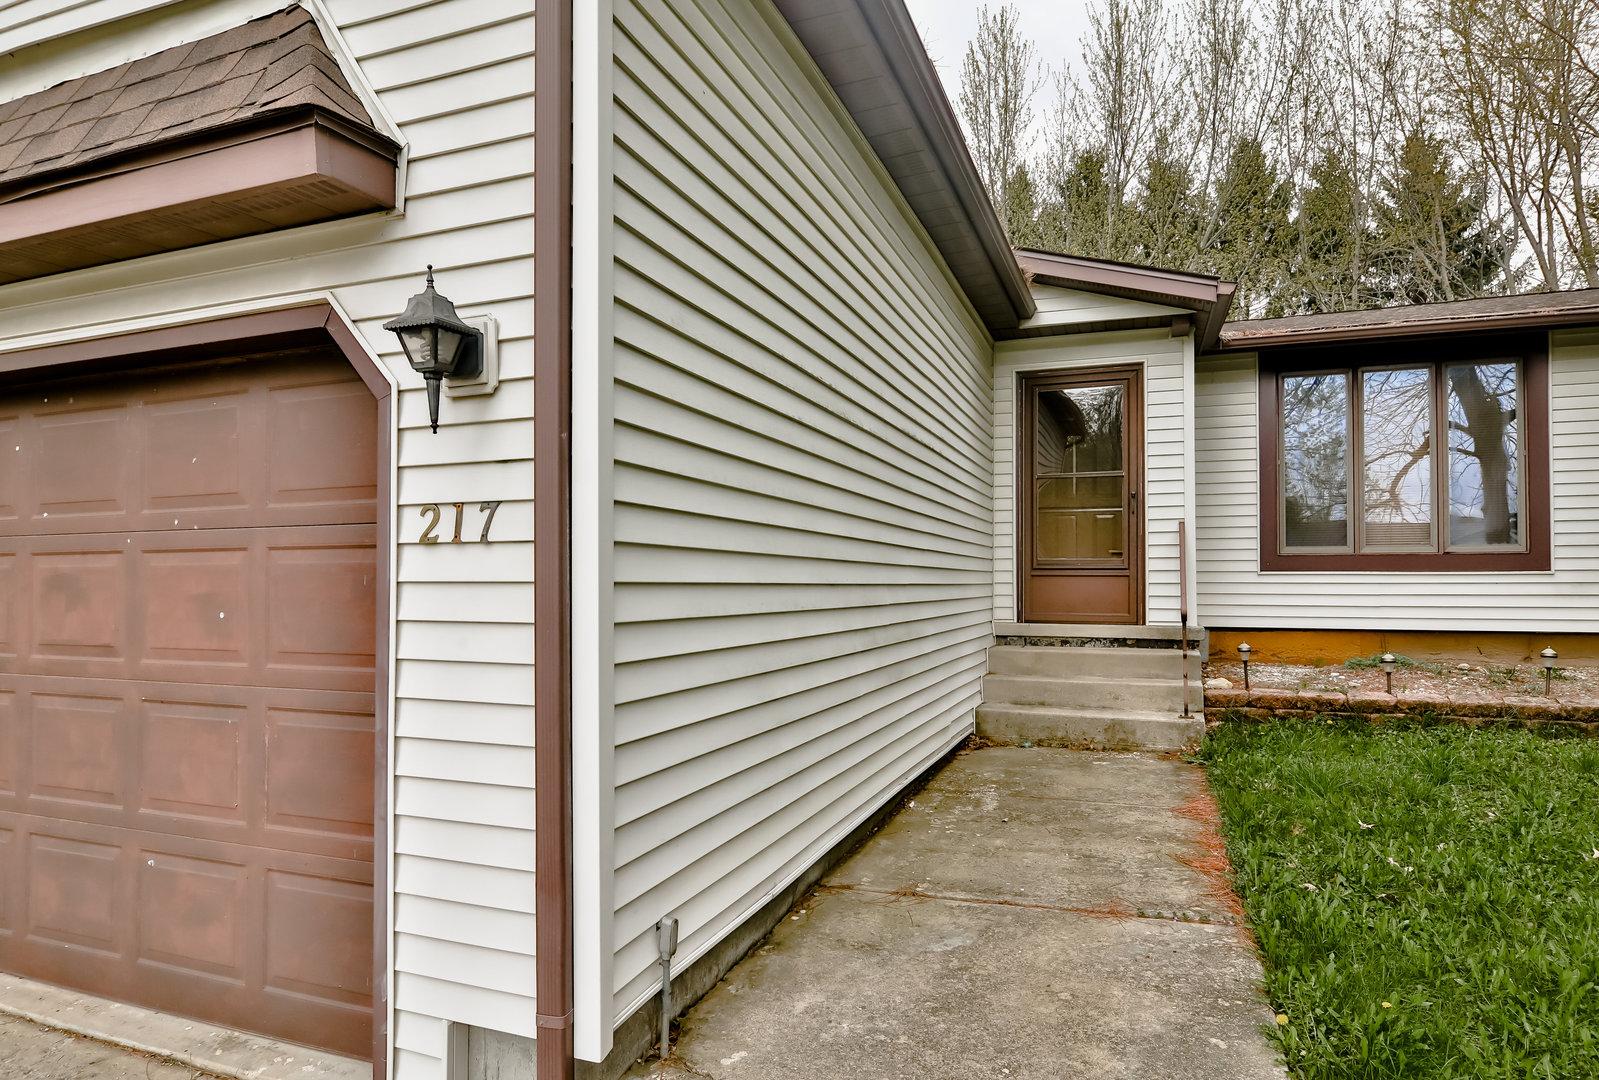 217 Briarcliff, Poplar Grove, Illinois, 61065